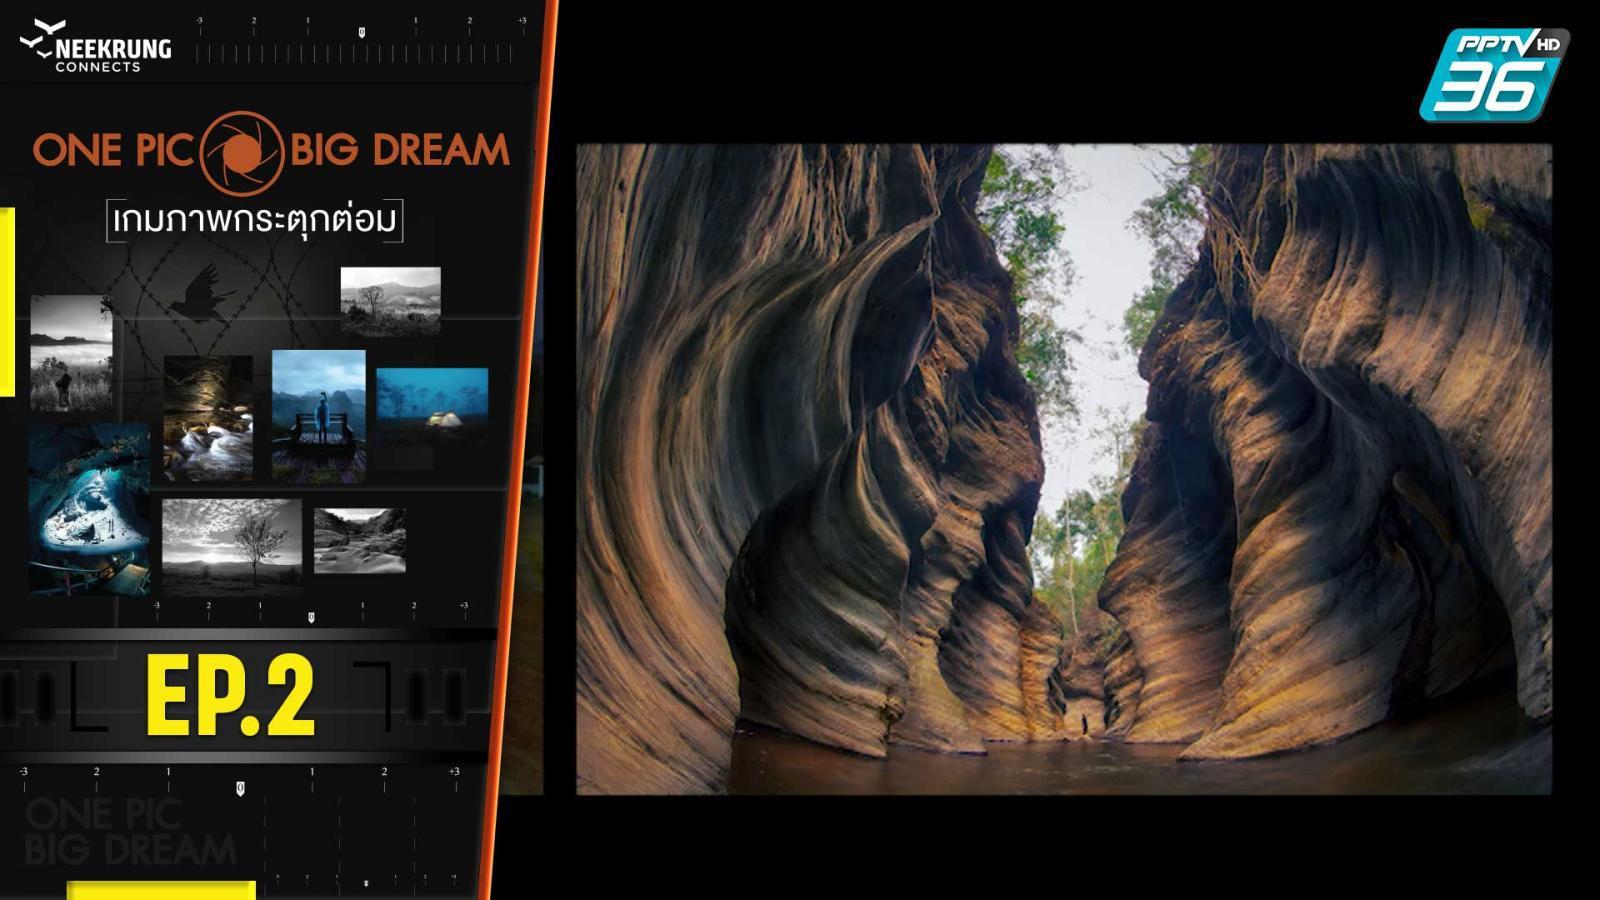 ONE PIC BIG DREAM เกมภาพกระตุกต่อม EP.2 | 8 ก.ค. 63 | PPTV HD 36